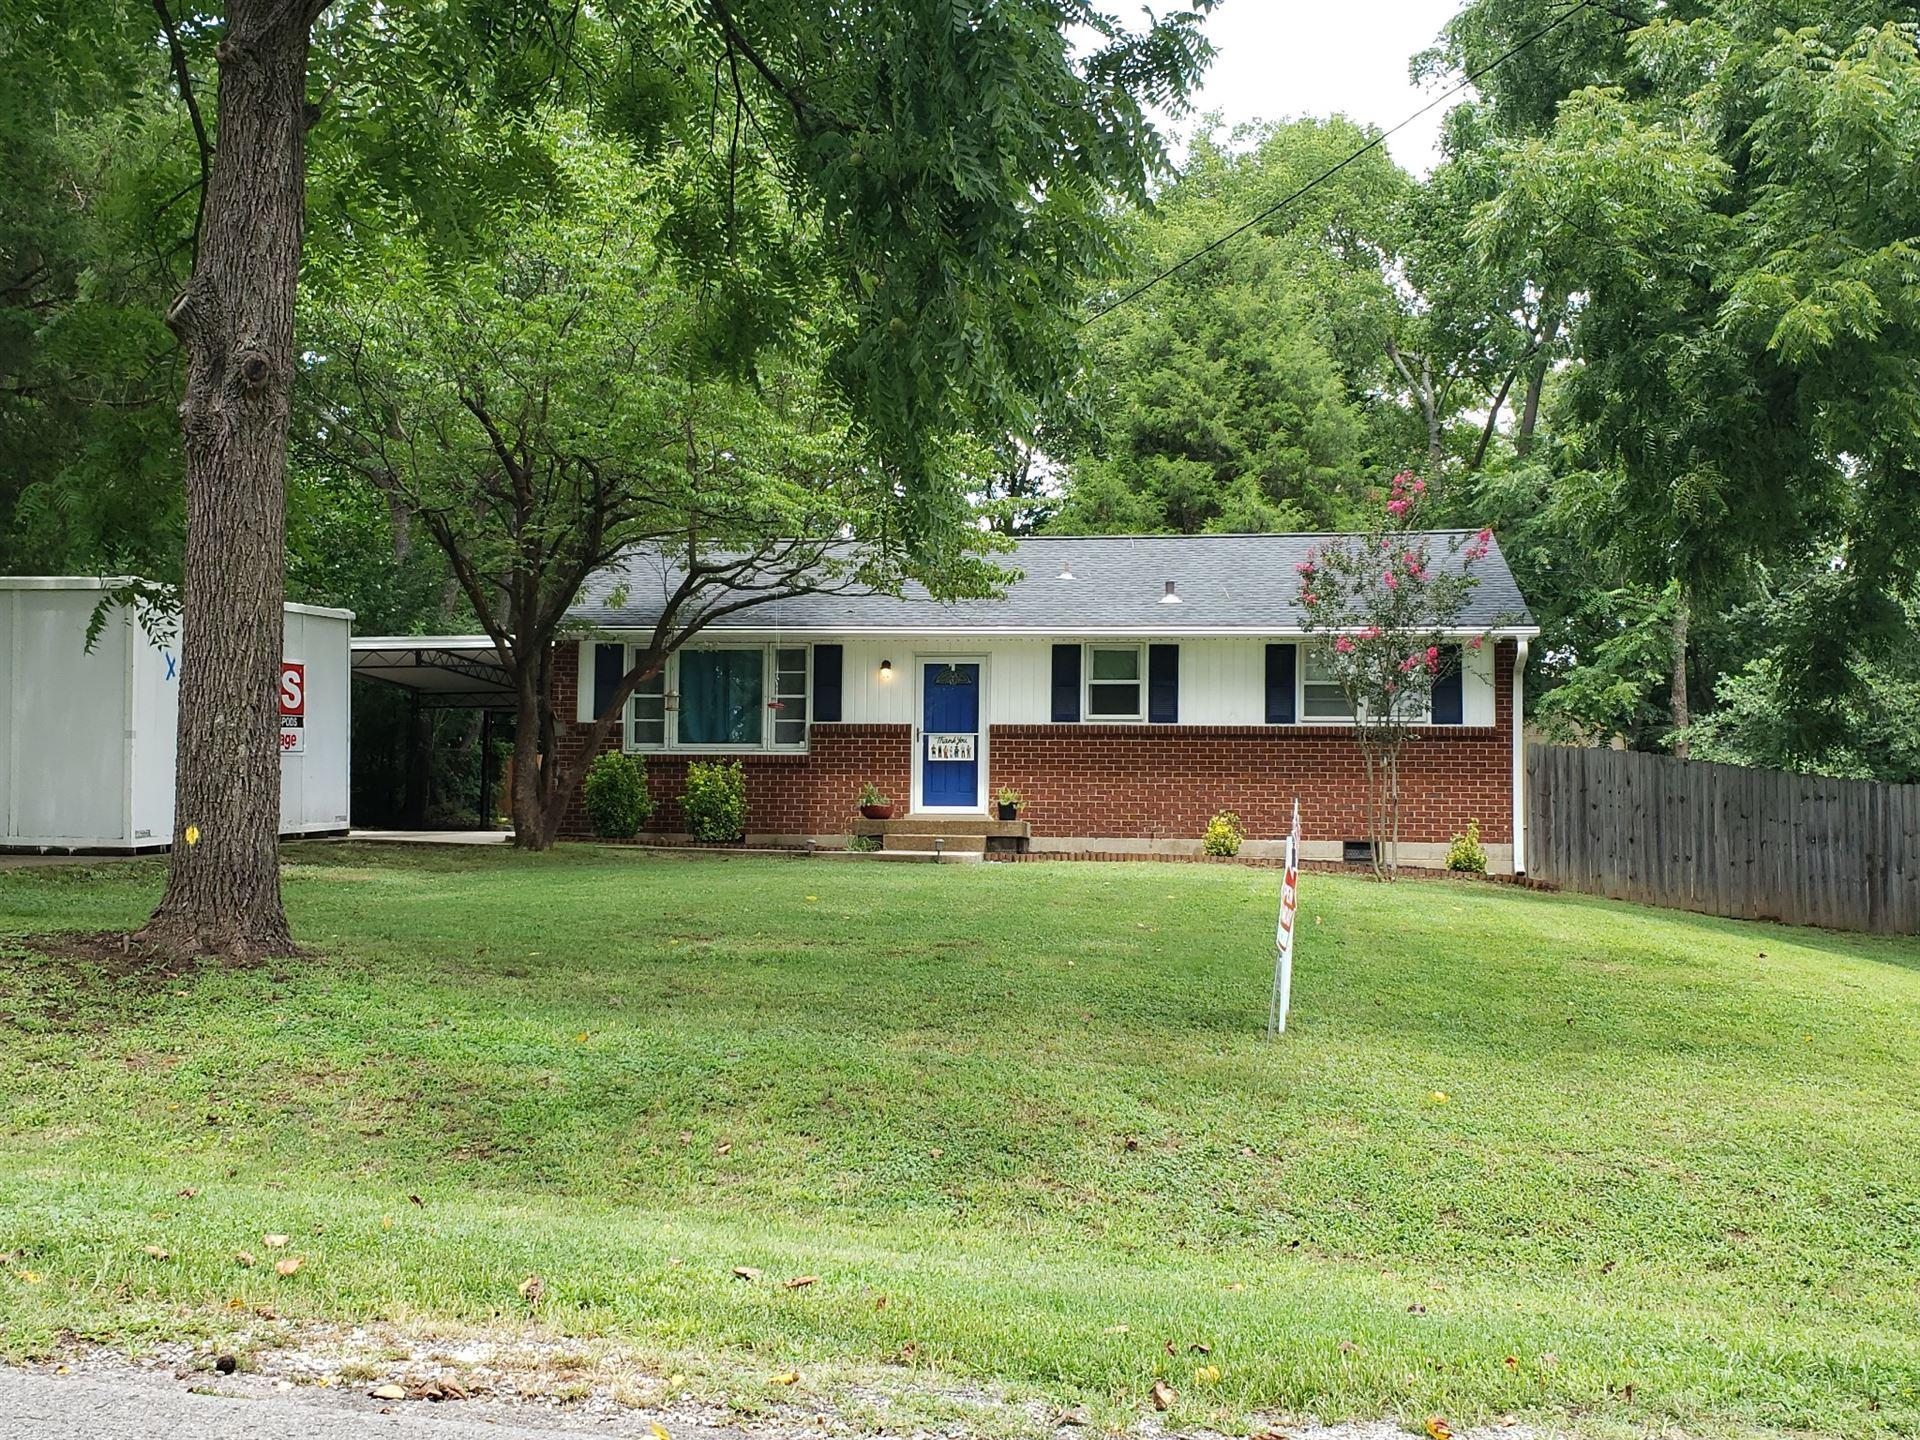 2902 Dunmore Dr, Nashville, TN 37214 - MLS#: 2172773